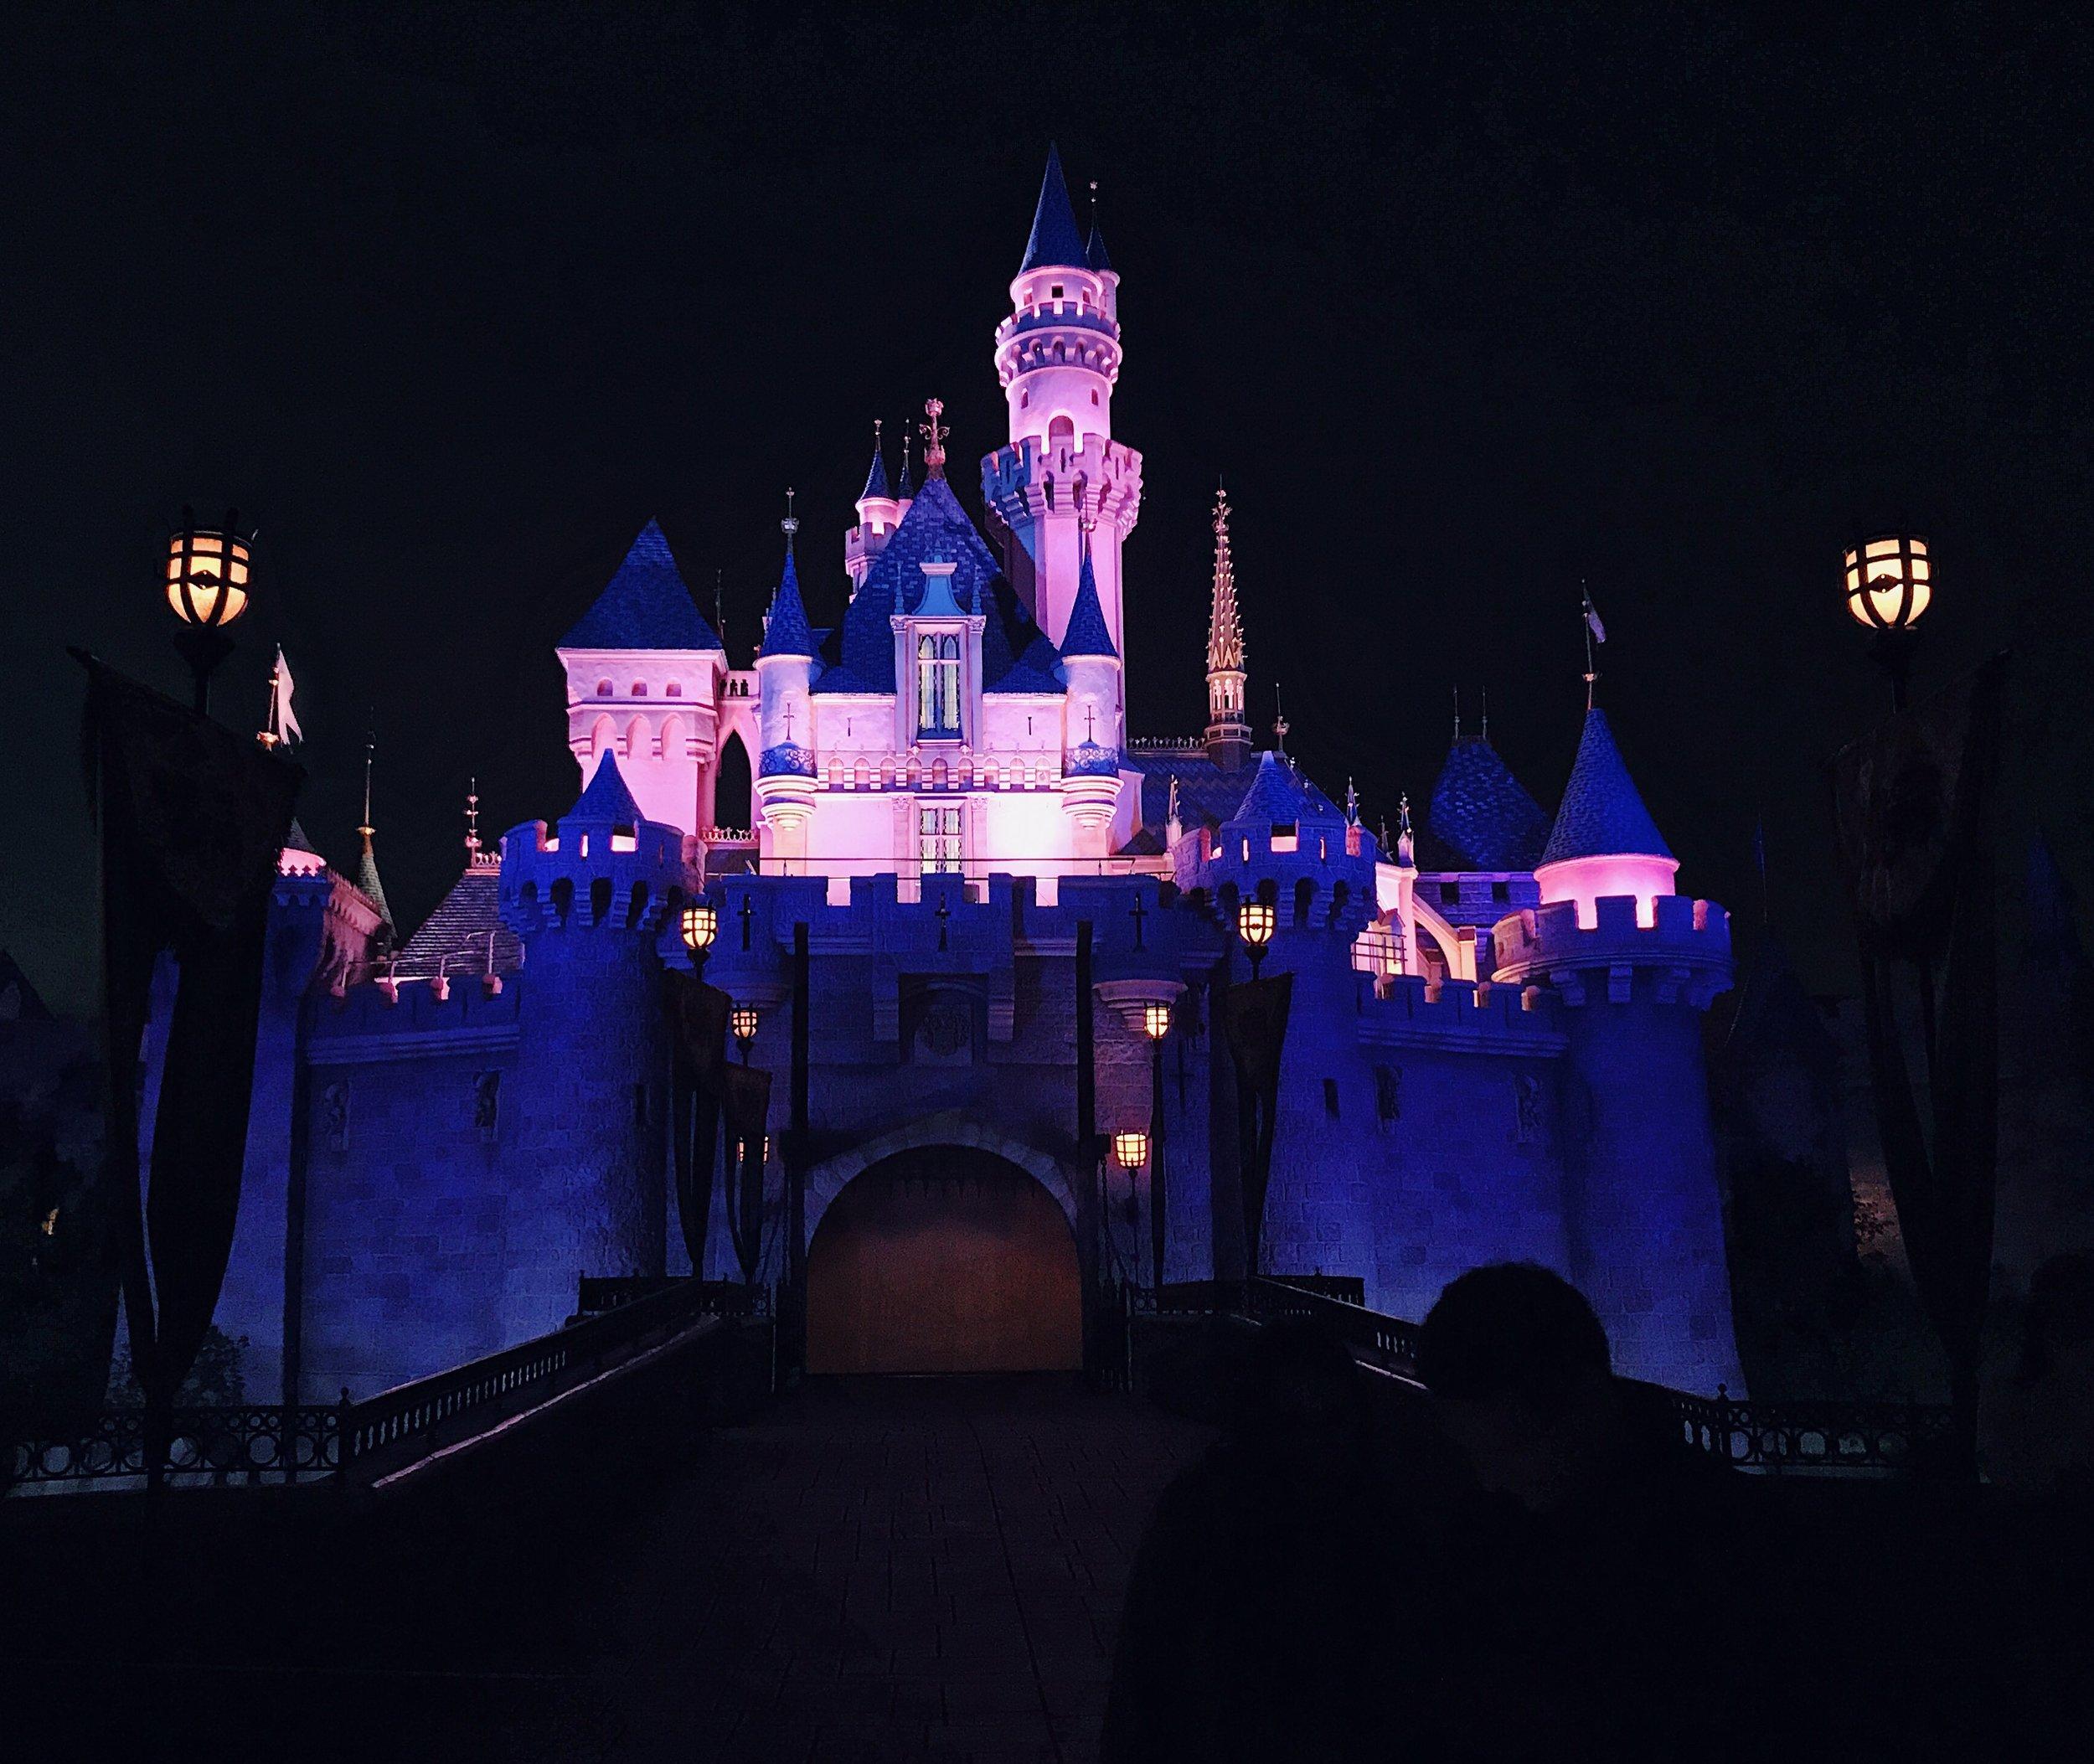 The Castle looks so pretty at night!!!